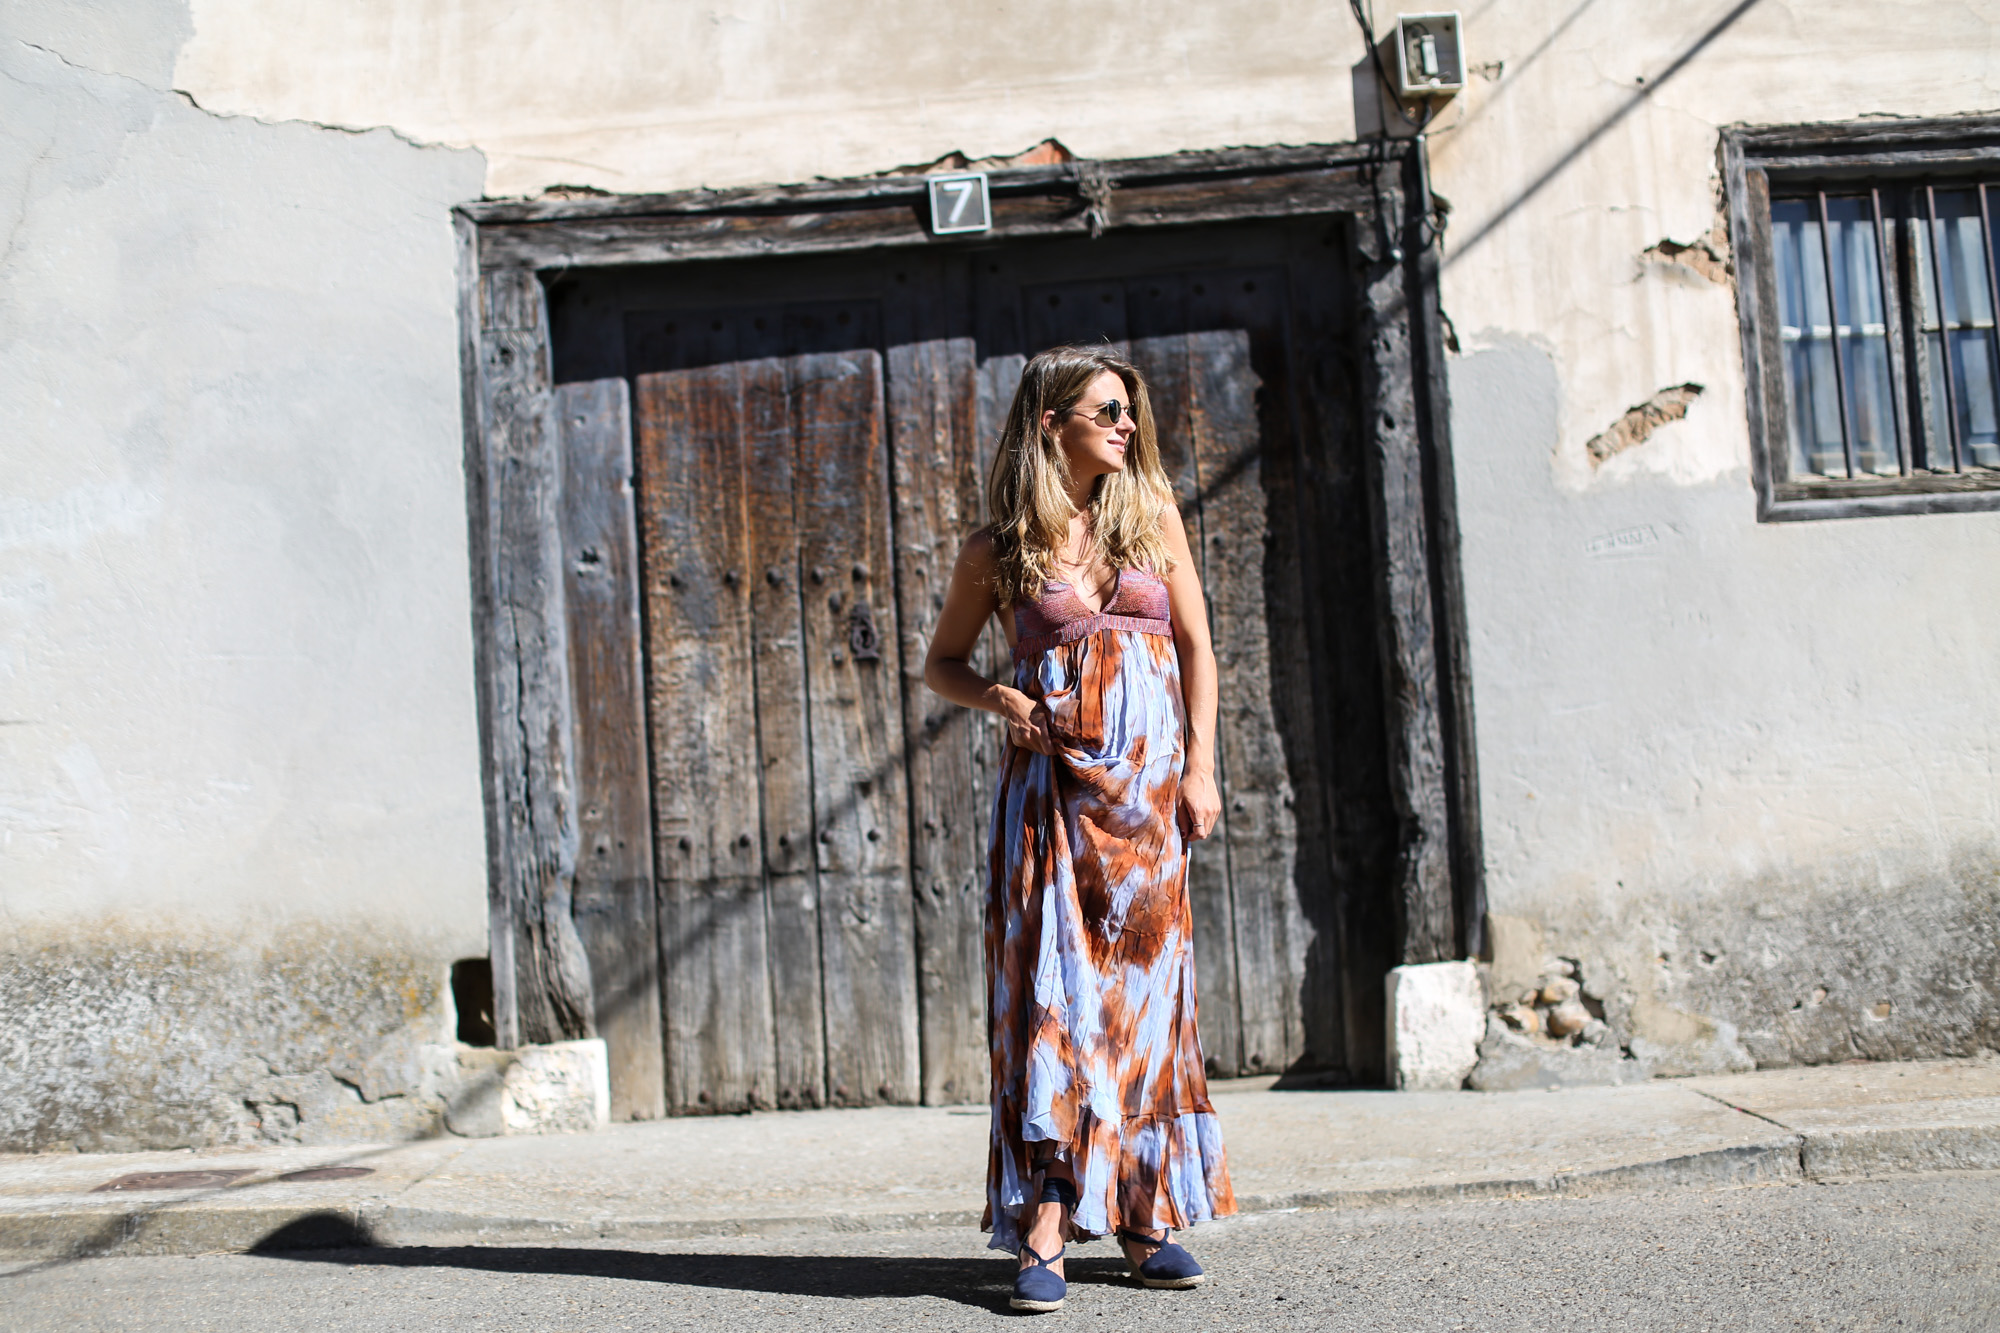 clochet_streetstyle_zara_boholongdress__pull&bear_flamingo_oversized_denimjacket-3